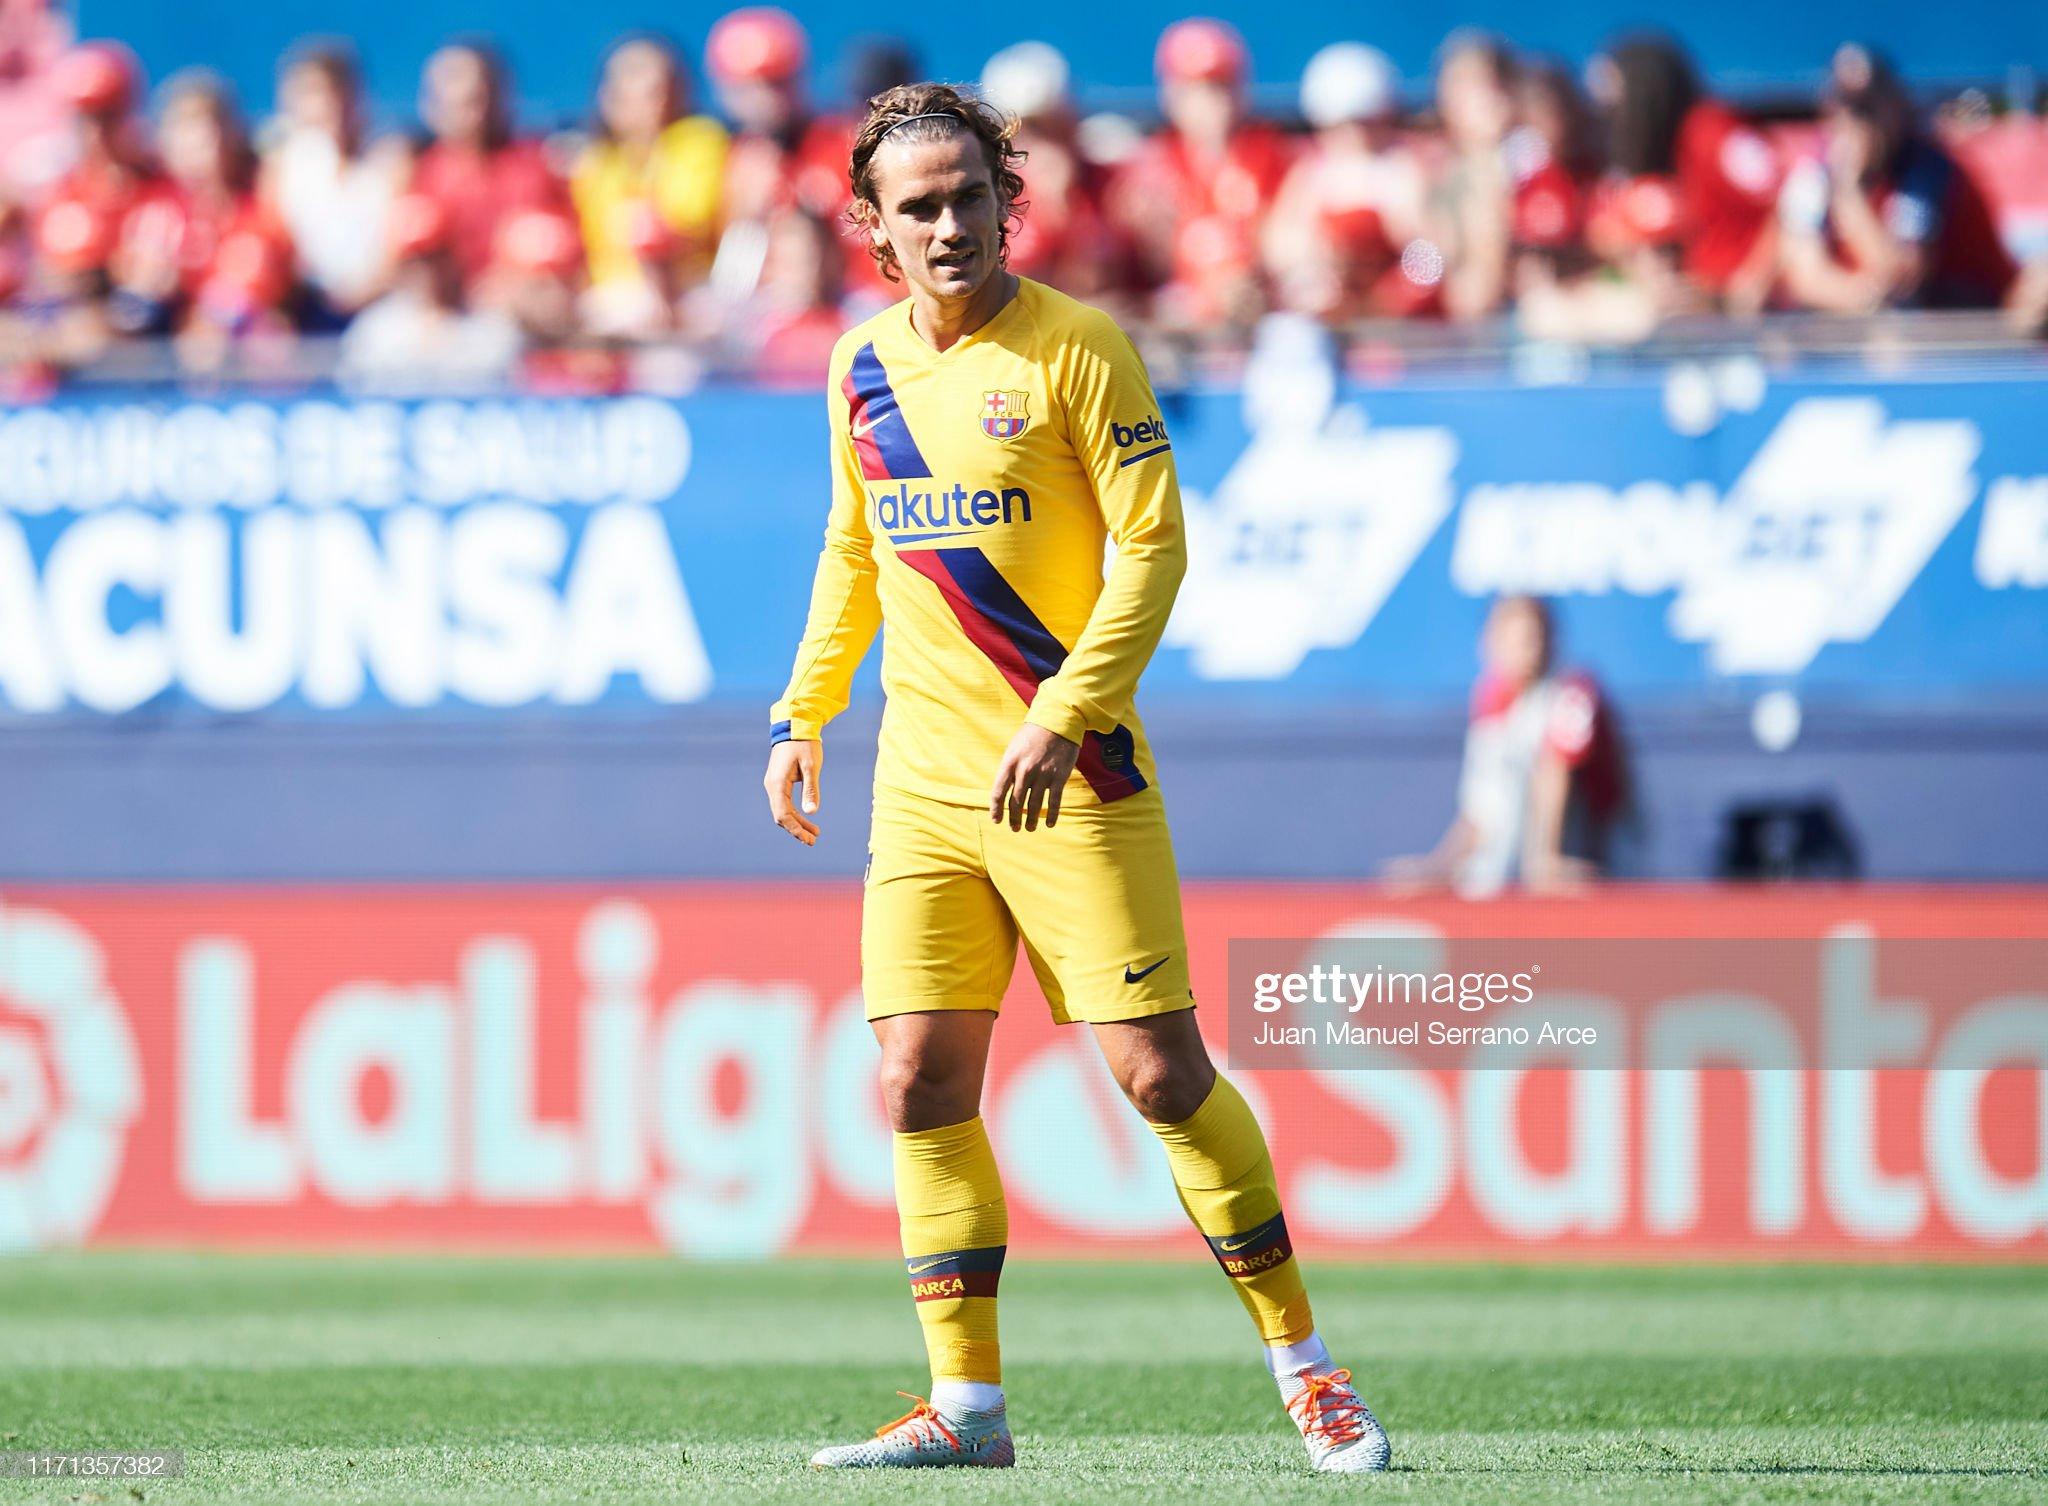 صور مباراة : أوساسونا - برشلونة 2-2 ( 31-08-2019 )  Antoine-griezmann-of-fc-barcelona-looks-on-during-the-liga-match-ca-picture-id1171357382?s=2048x2048